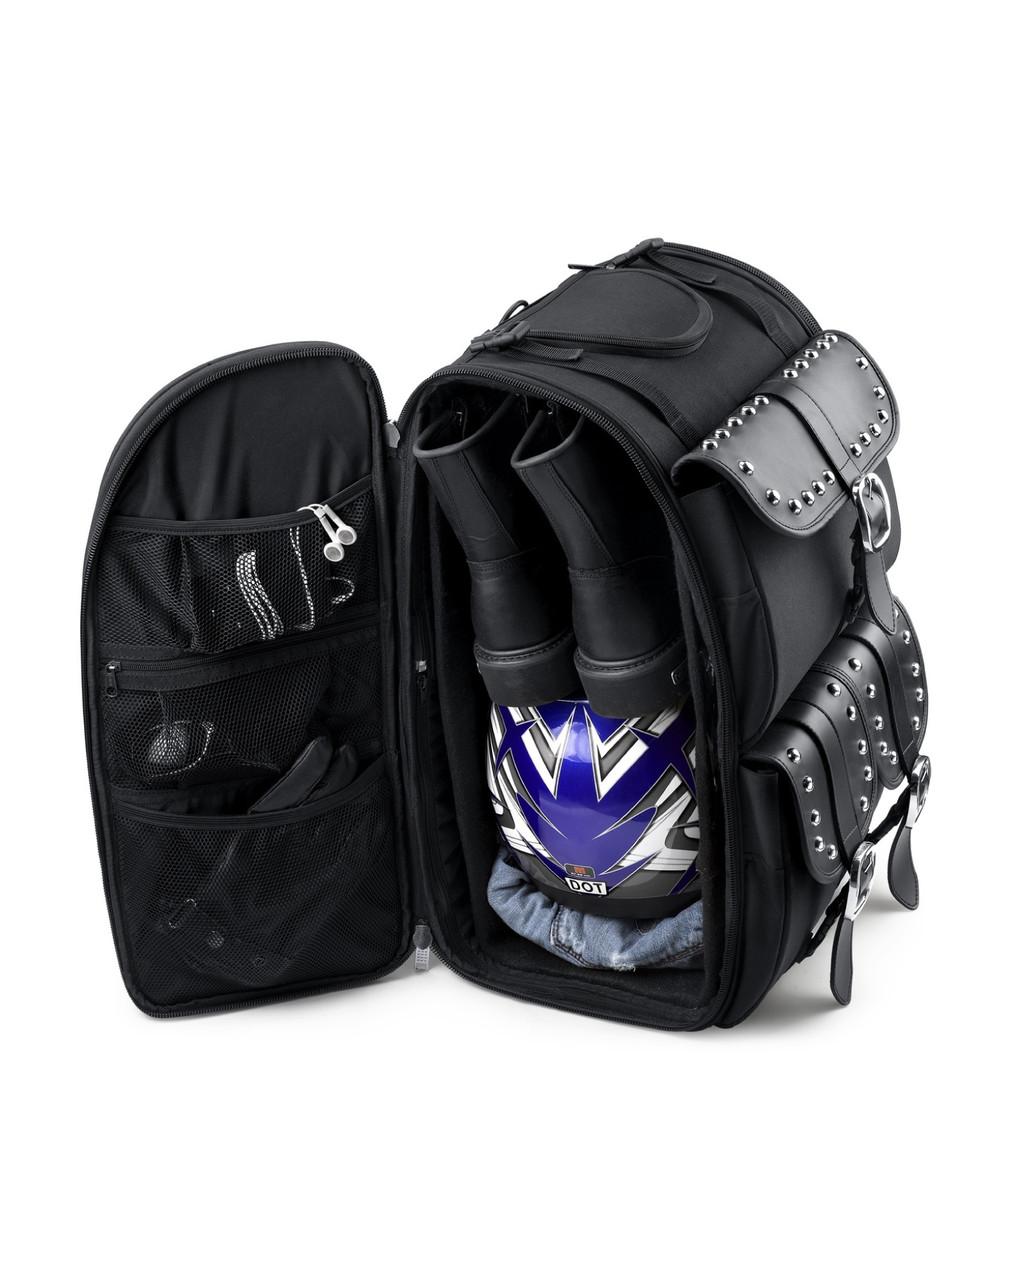 Kawasaki Viking Extra Large Studded Motorcycle Sissy Bar Bag Storage View